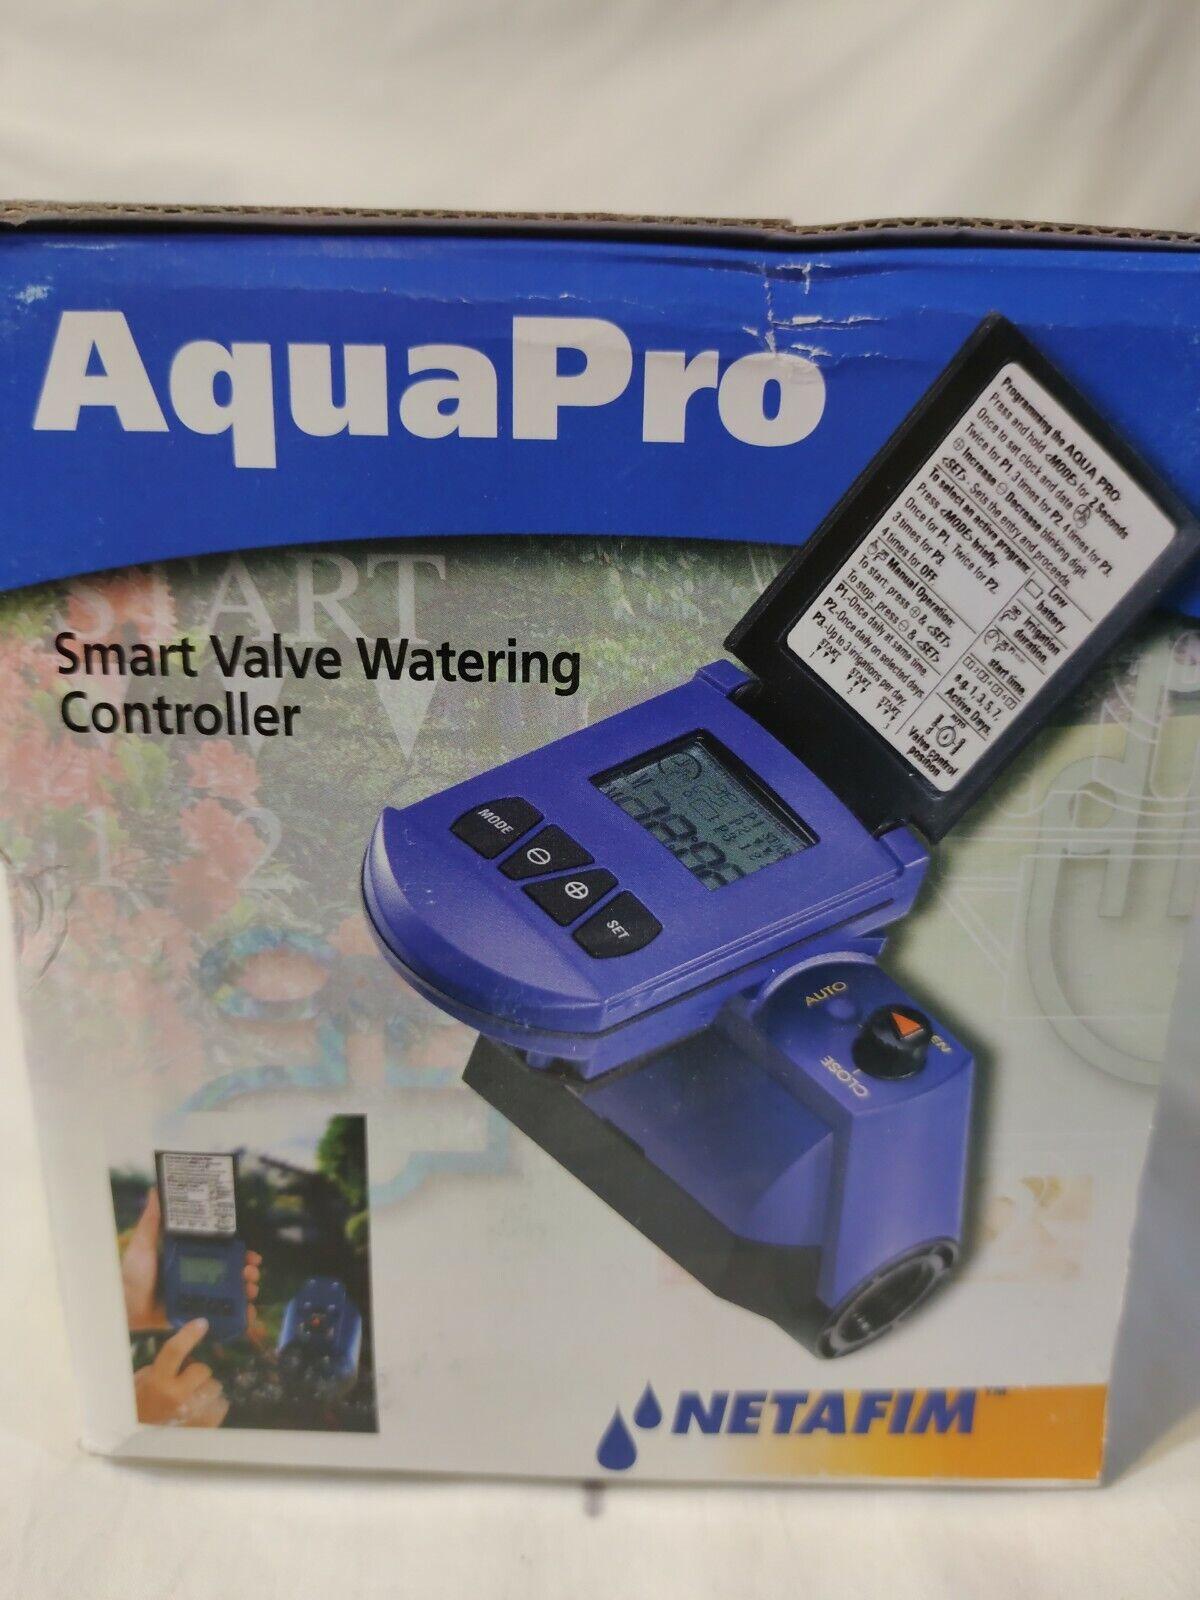 Netafim Aqua Pro Smart Valve Watering Controller DC 1